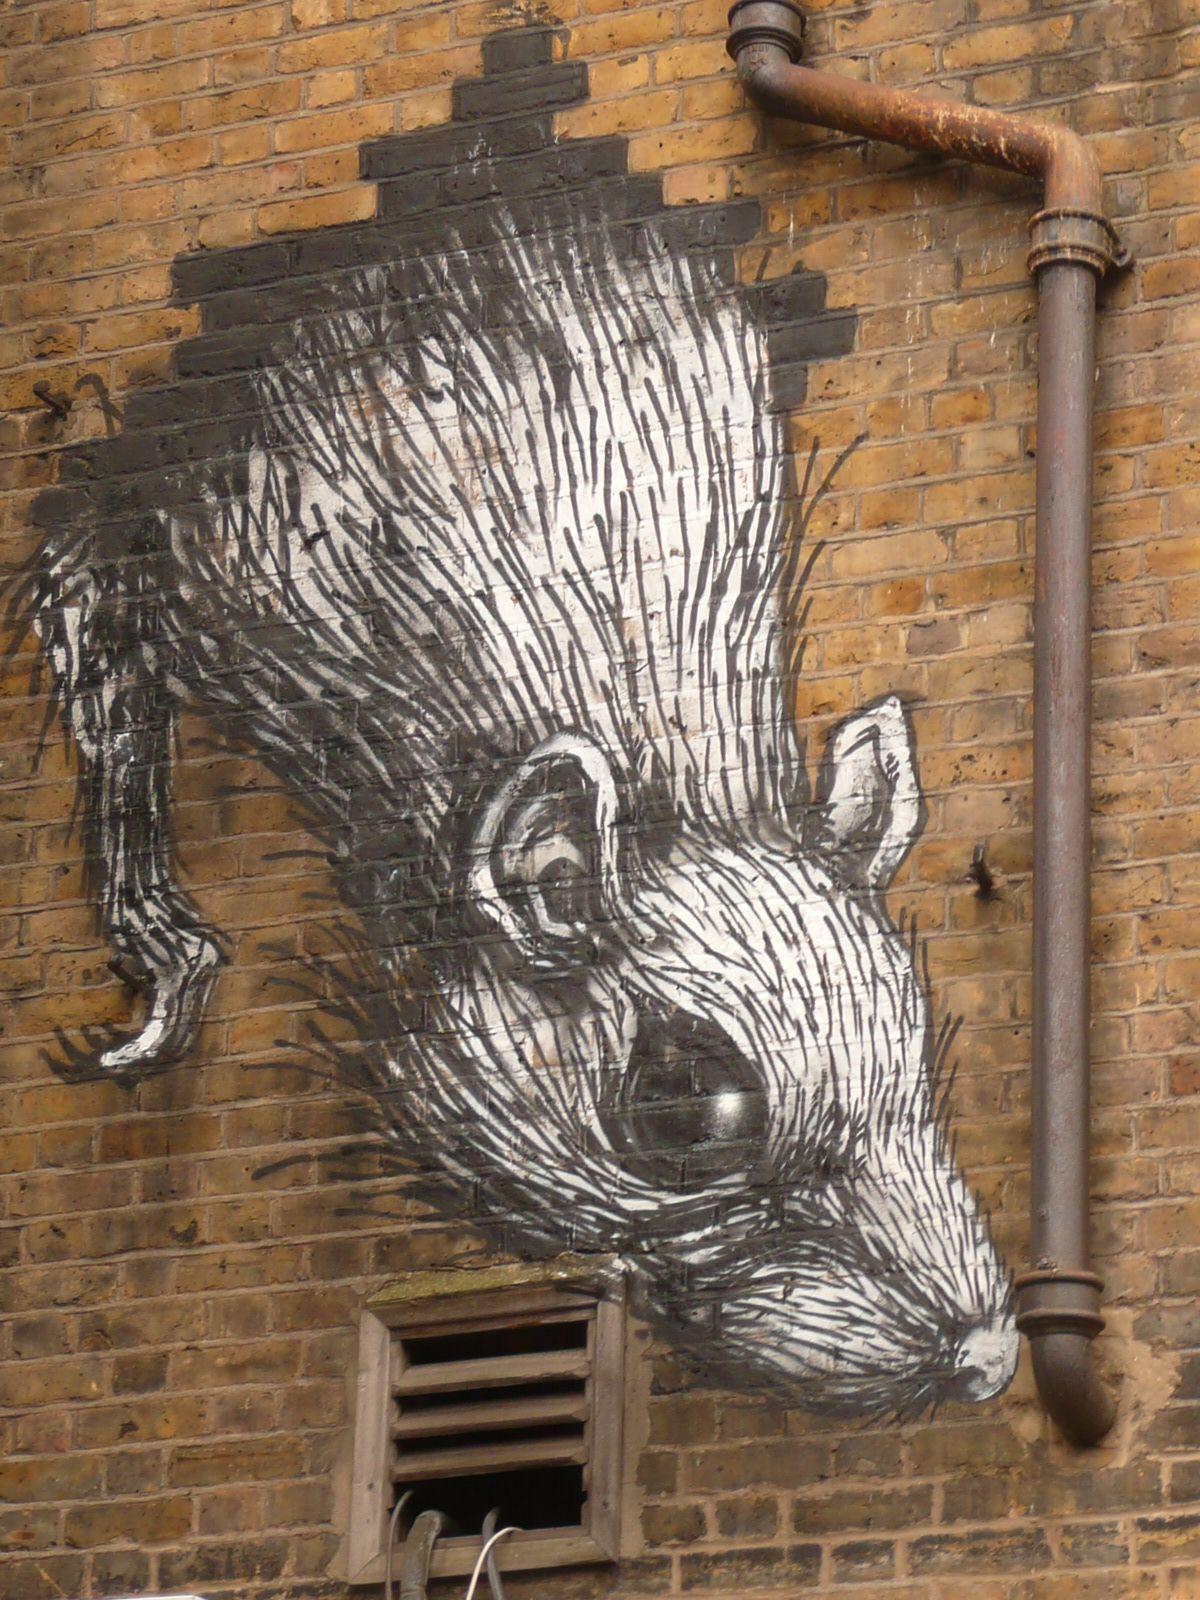 London graffiti artist